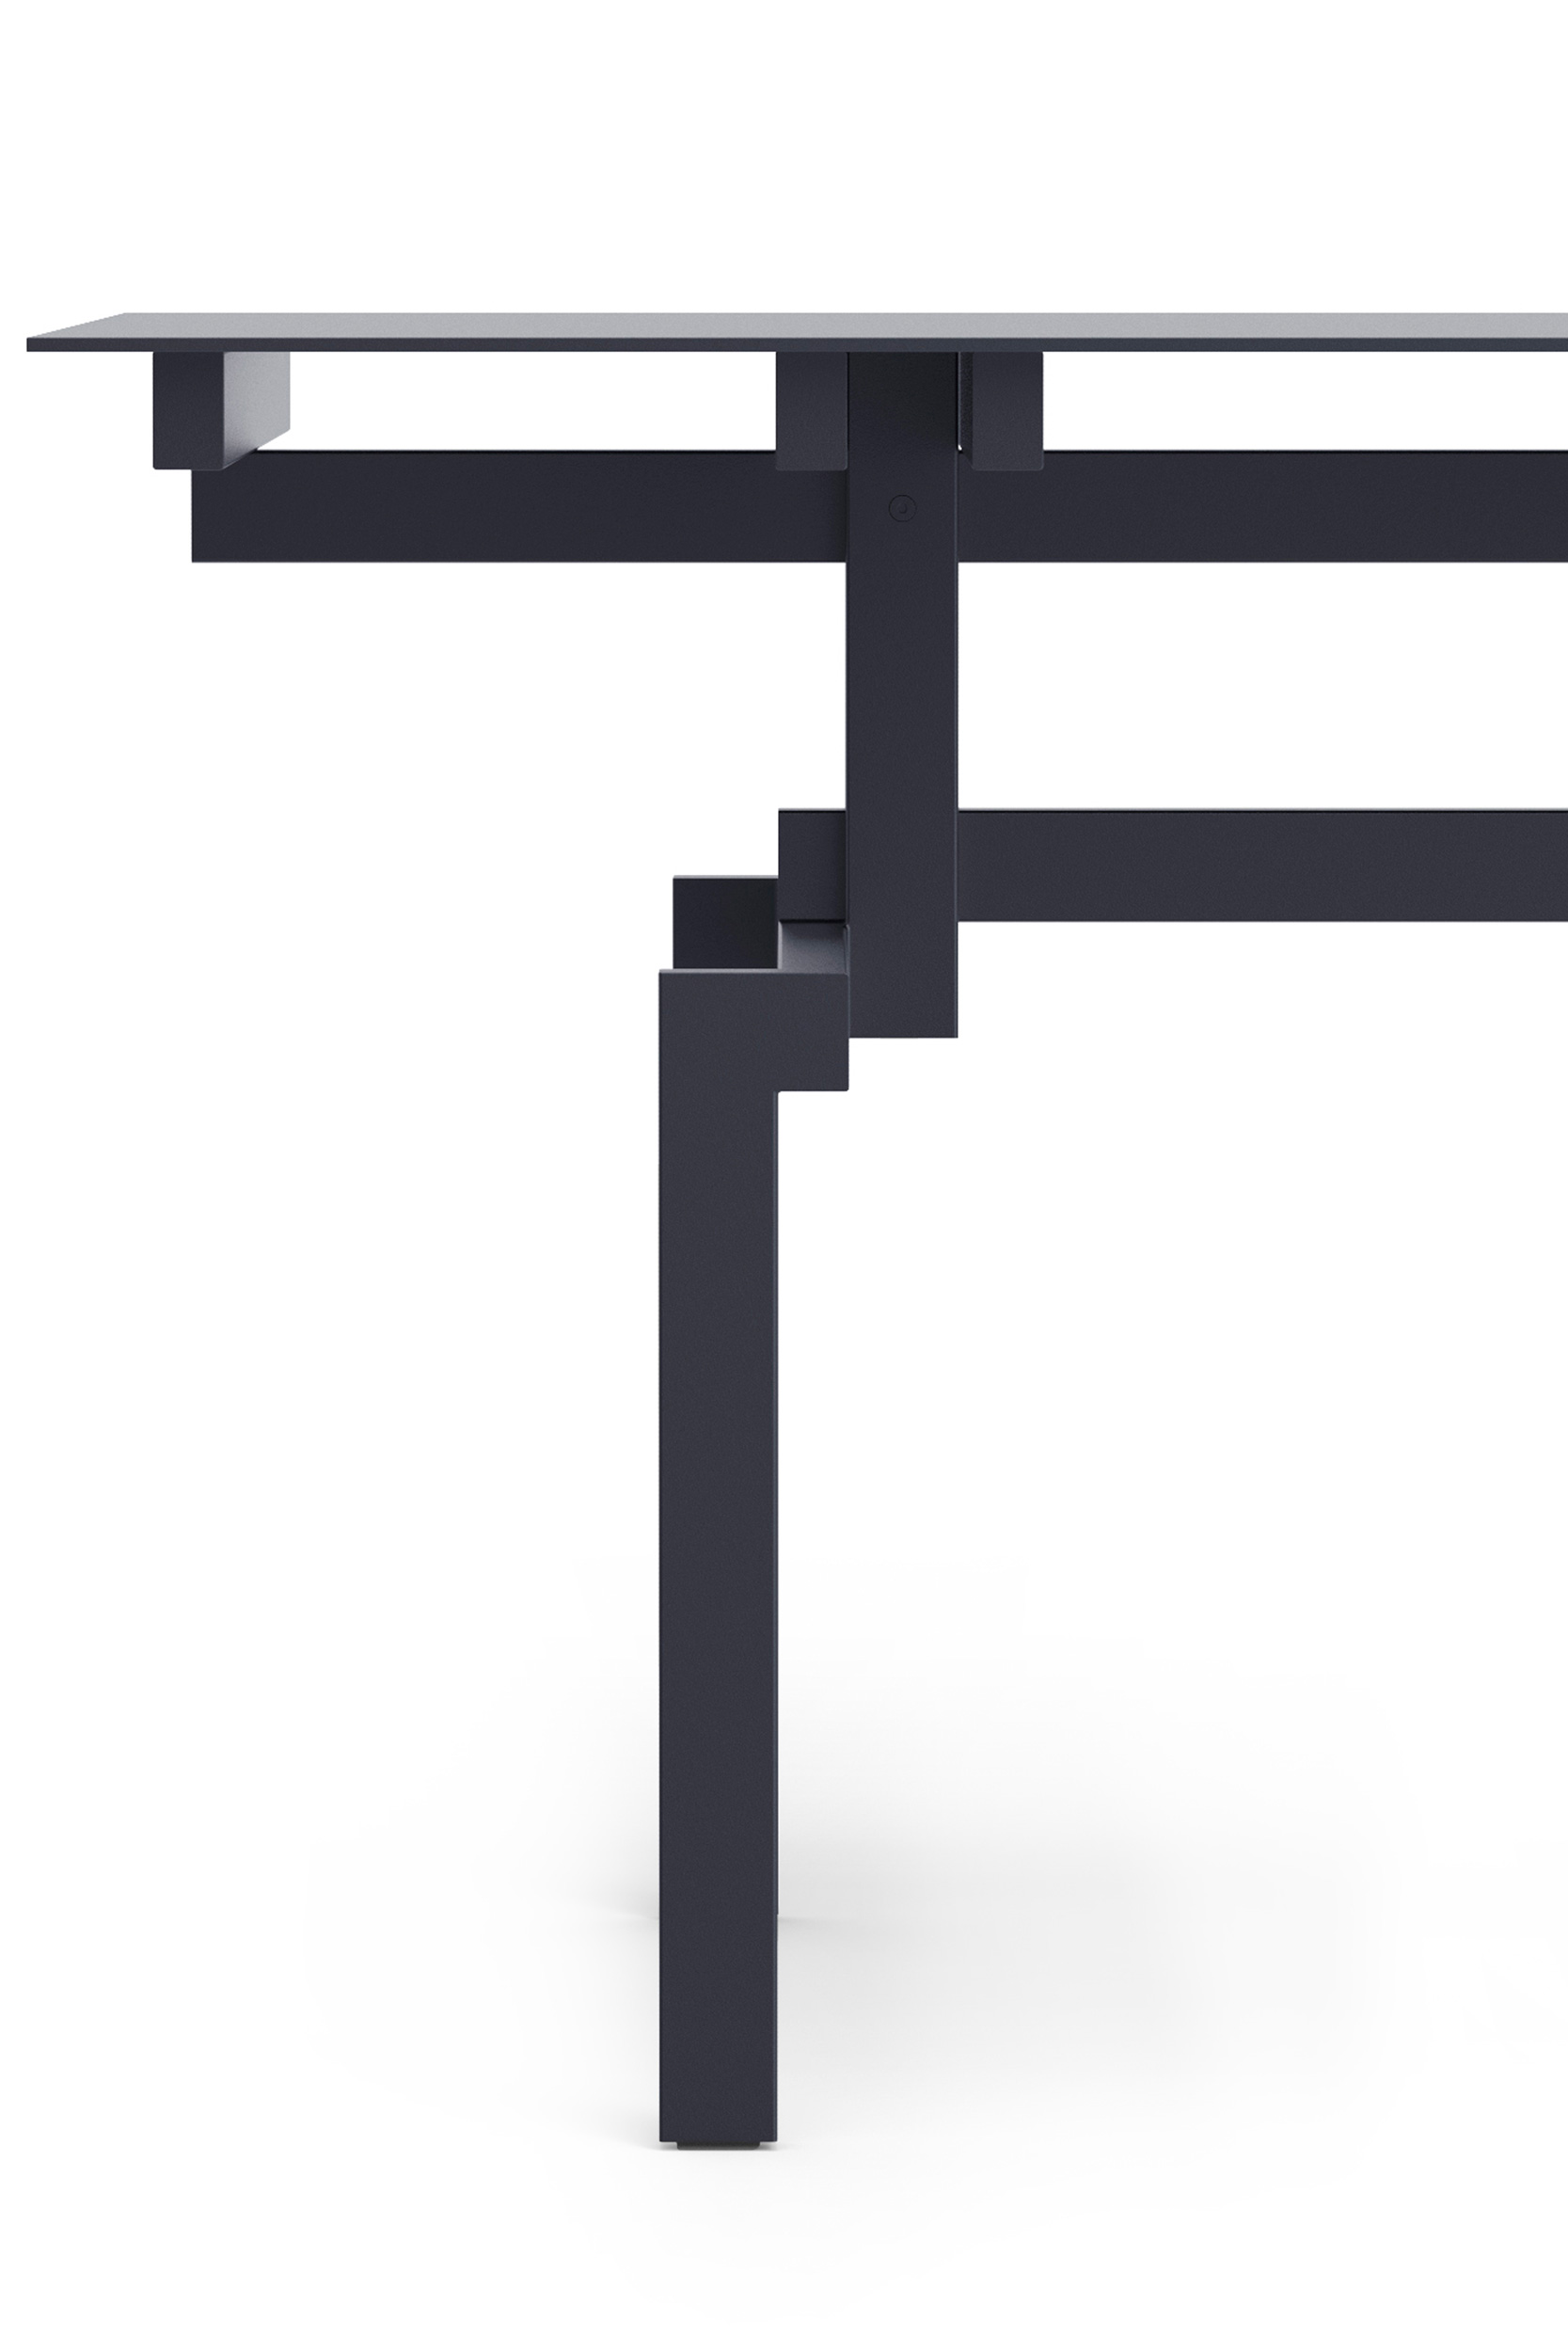 Studio-Pascal-Howe_DiningTable_BlackGrey_Shop.jpg